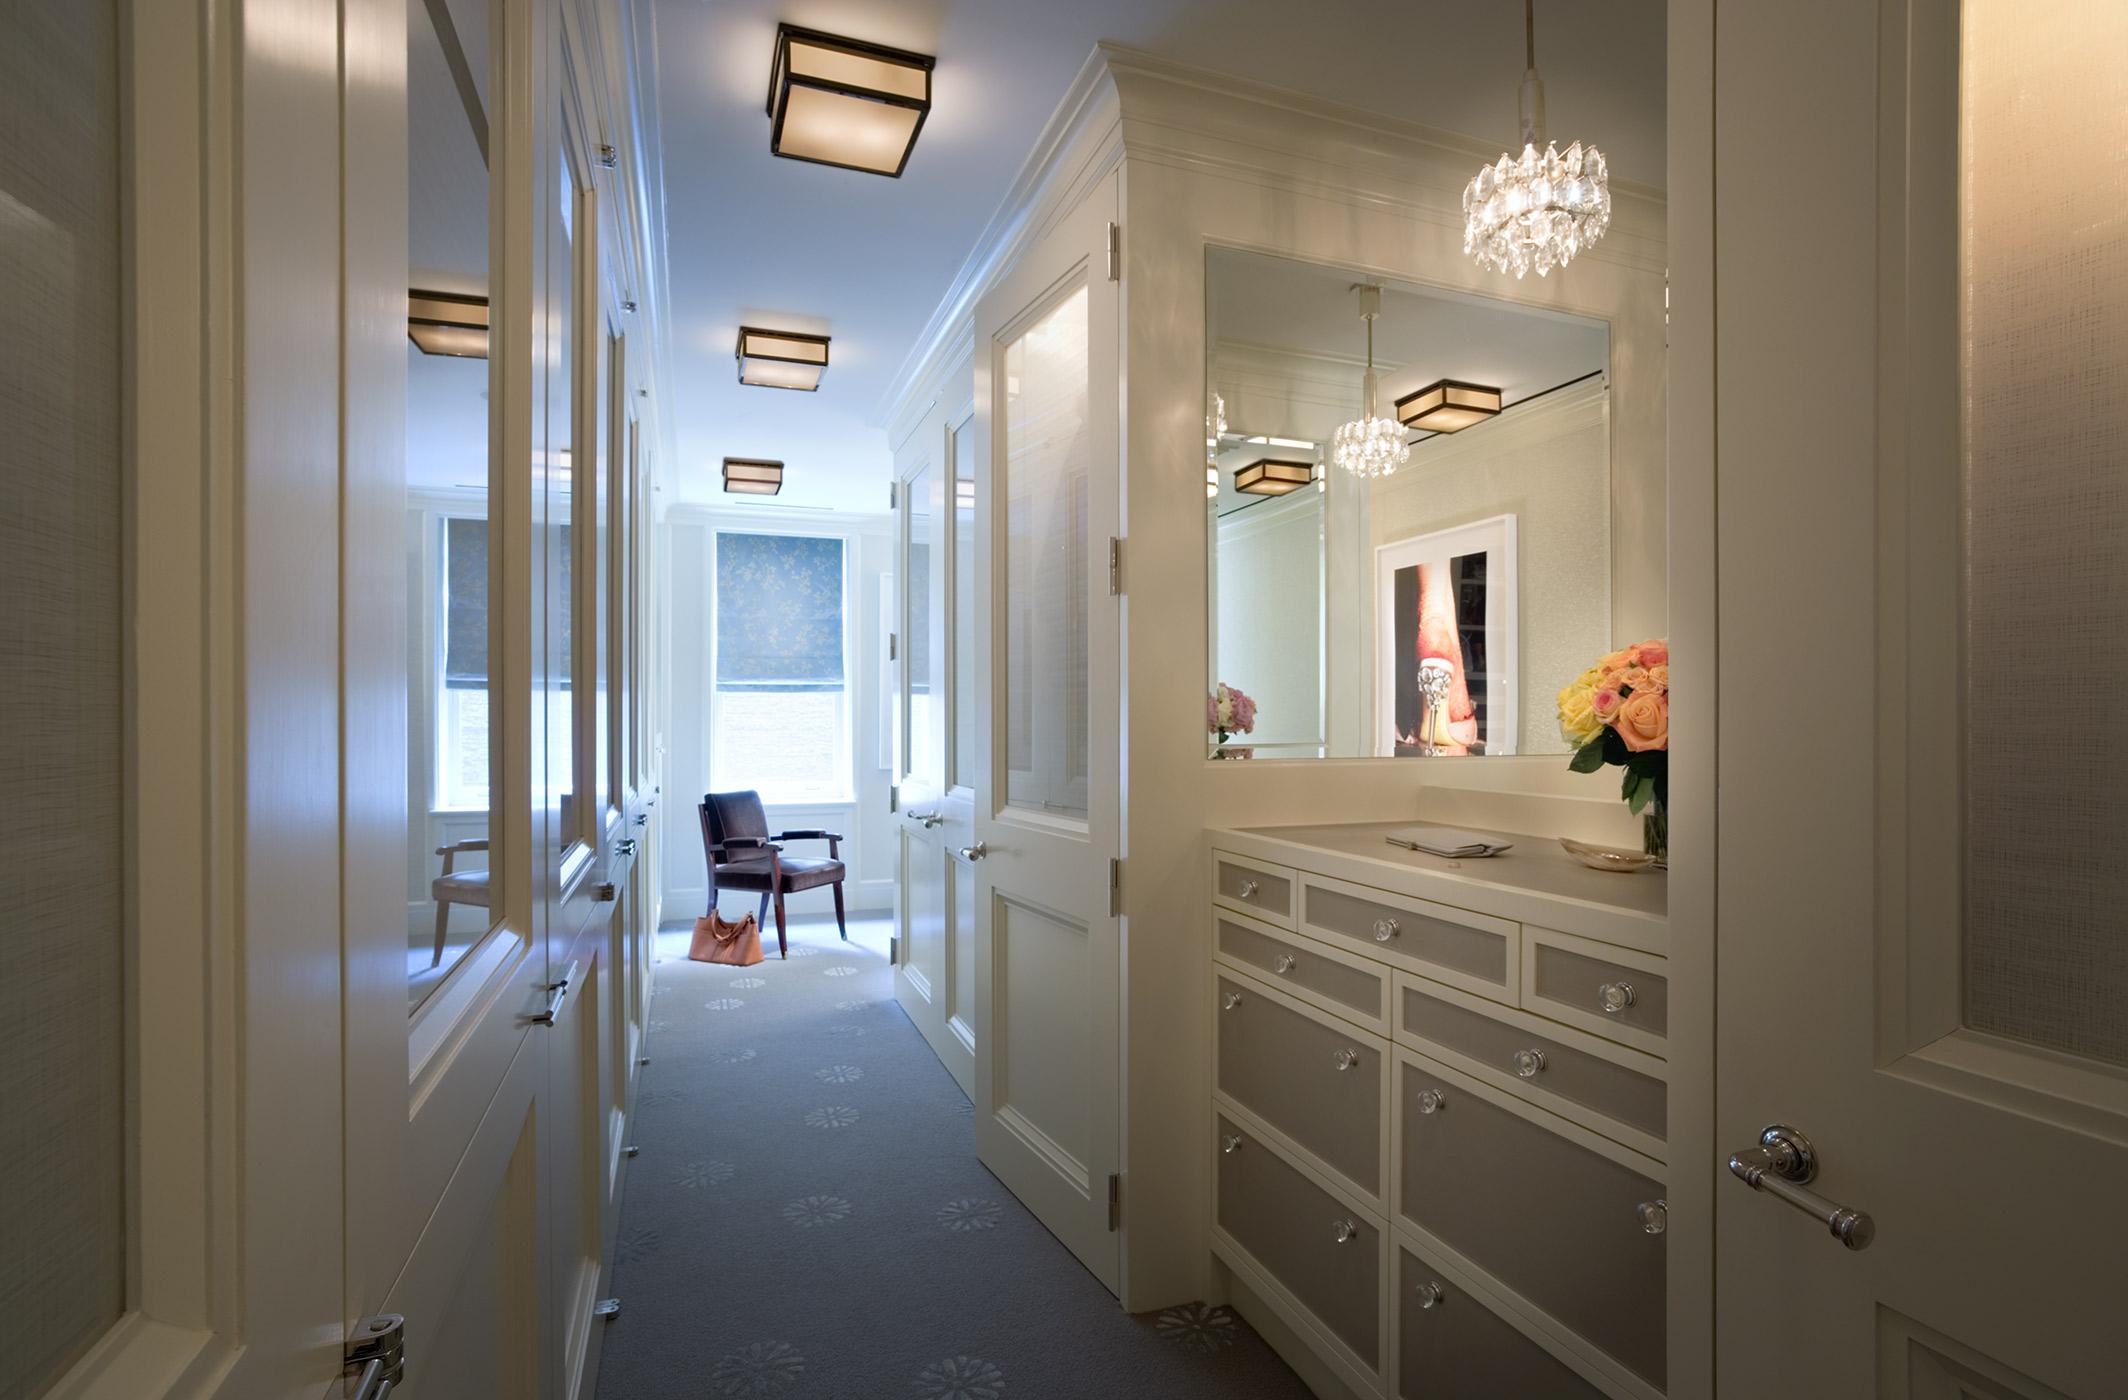 Park Ave Apartment, New York